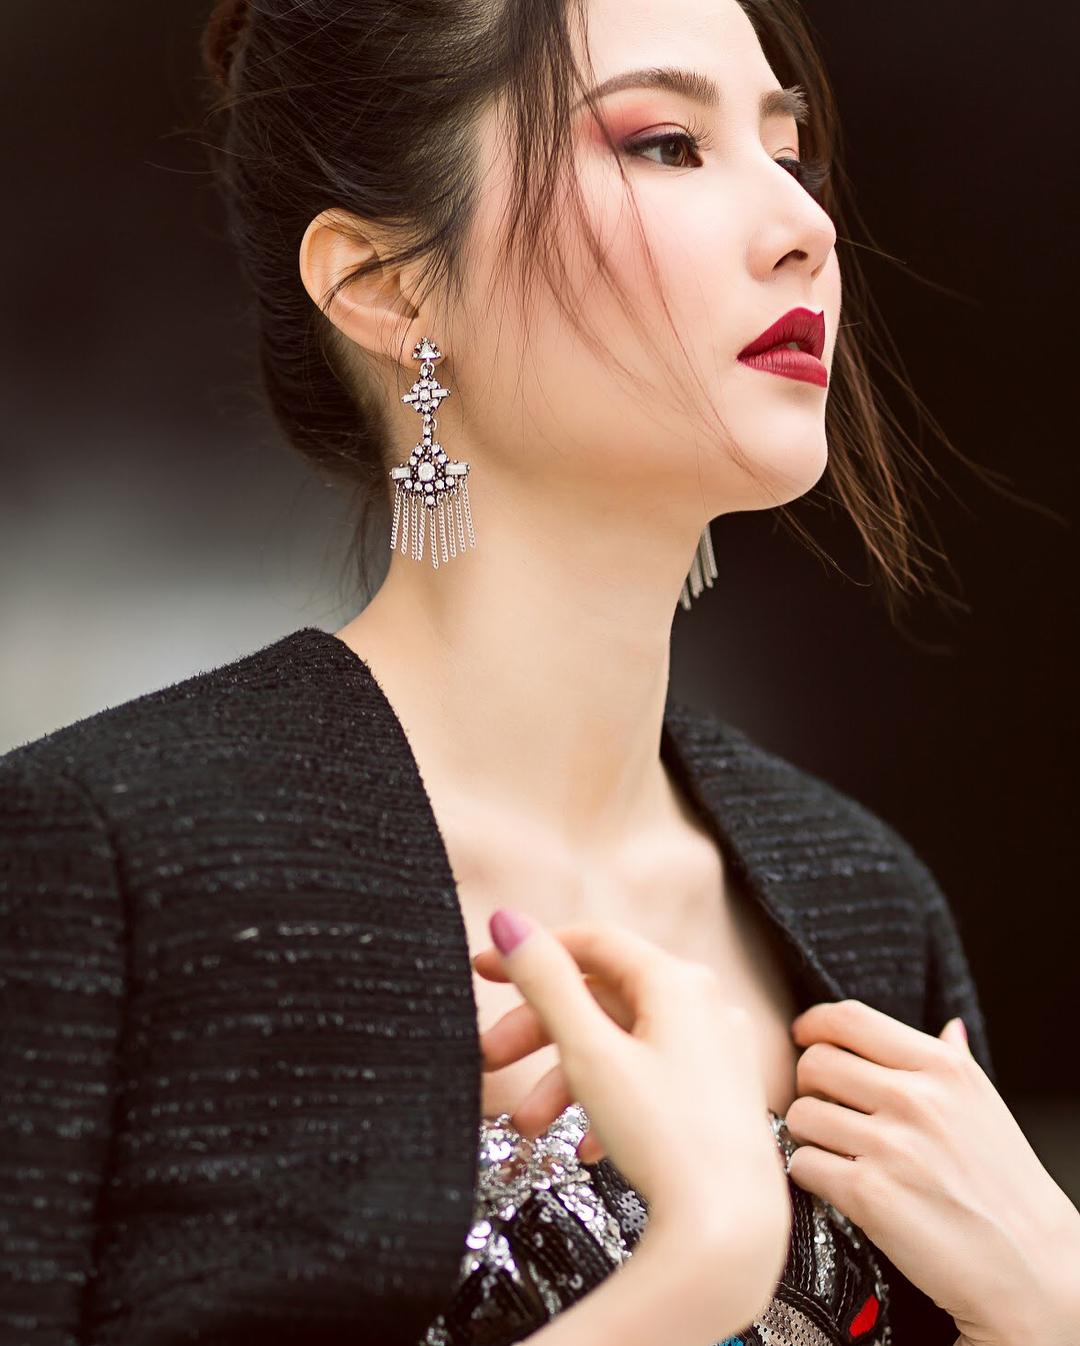 diem-my-9x-ngam-nghia-street-style-cua-sao-viet-tai-seoul-fashion-week